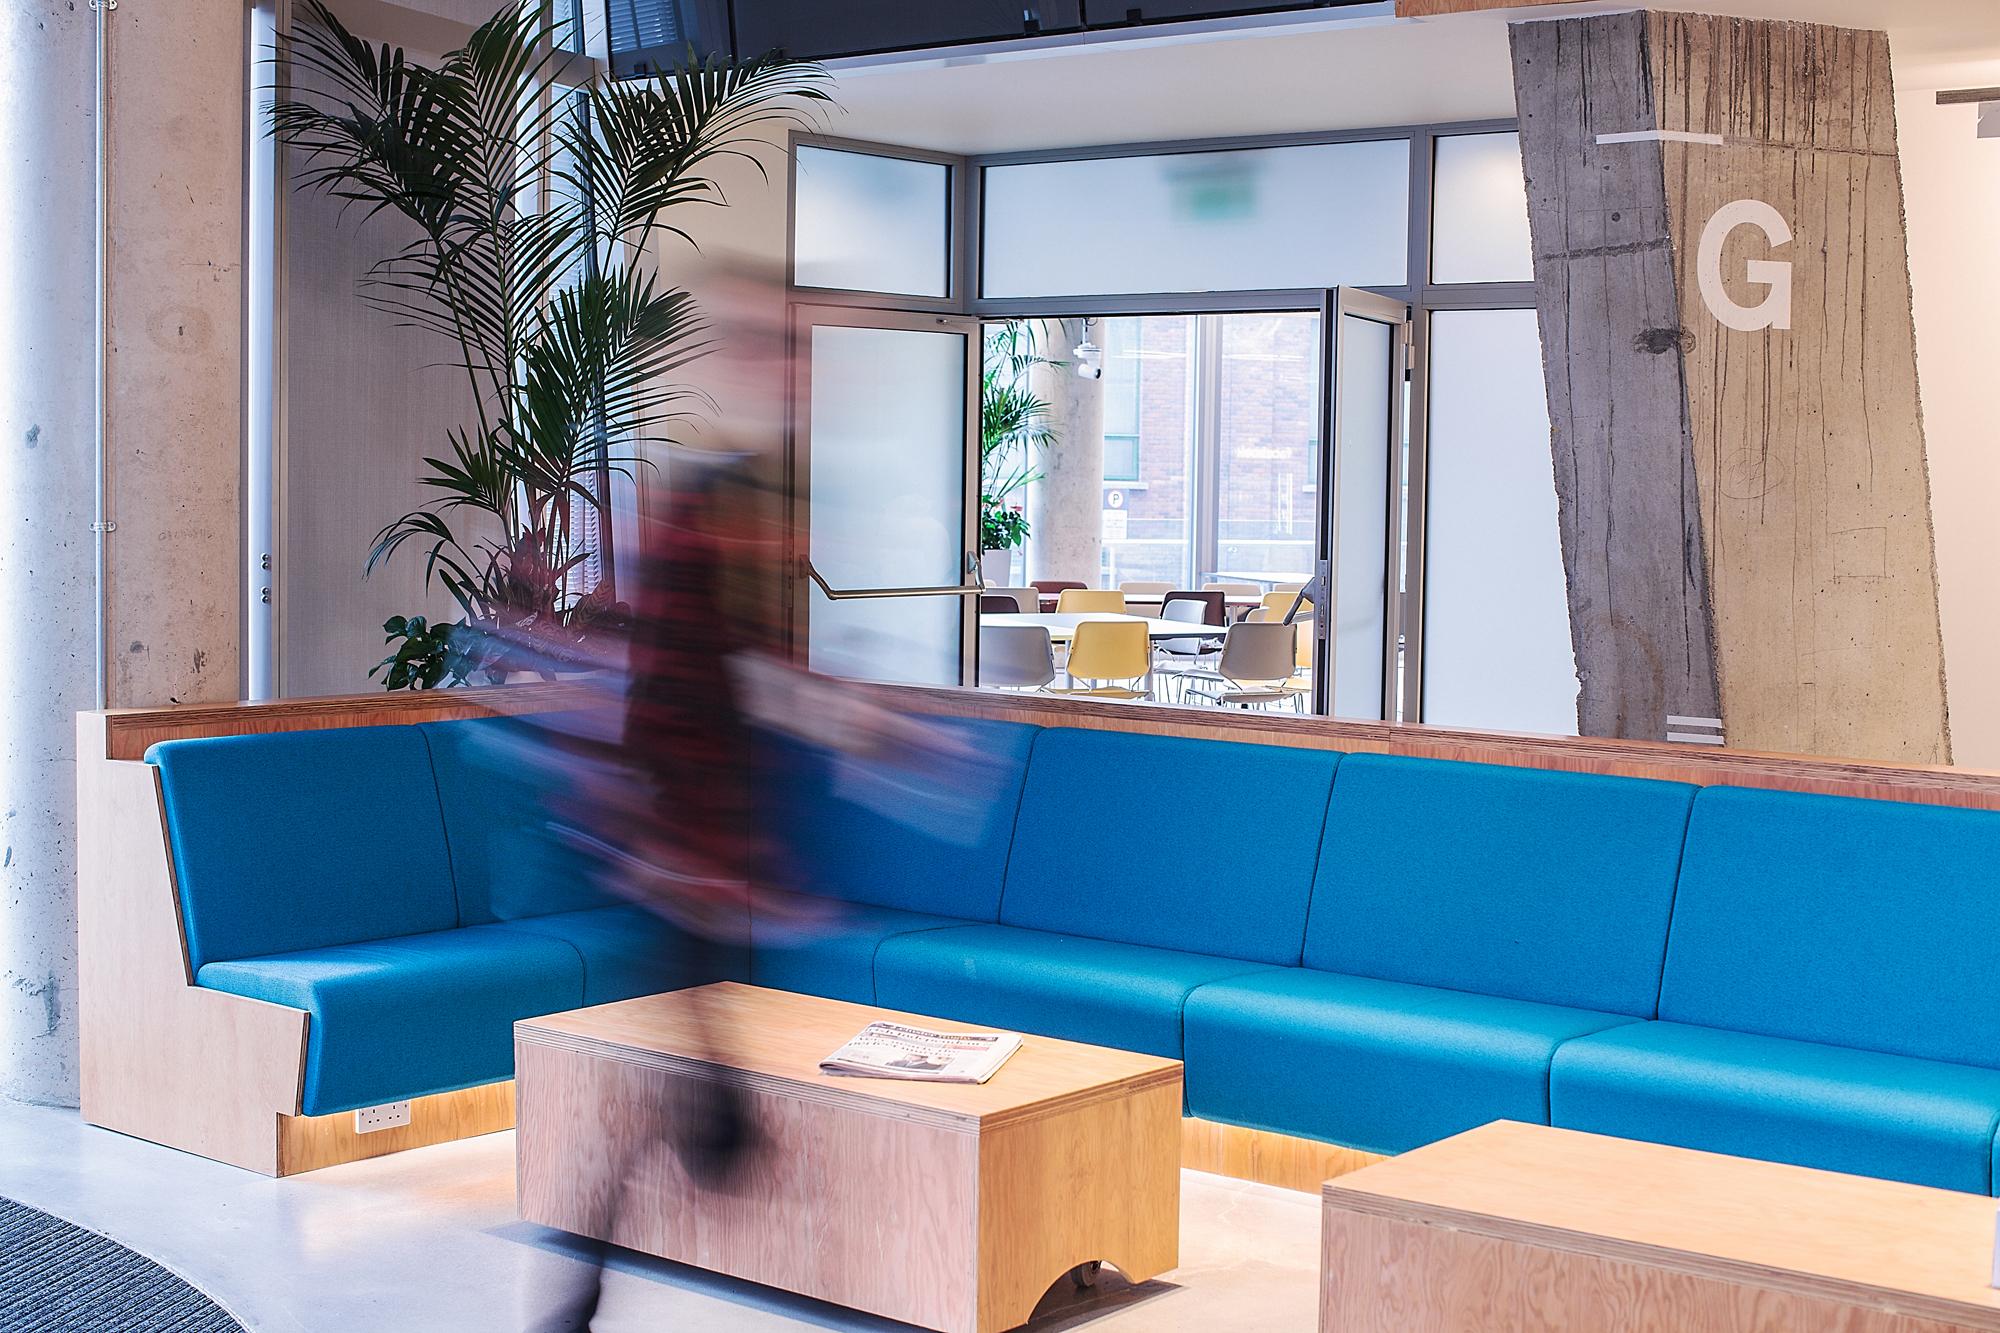 Cover image: Social Media Company HQ Wayfinding (2014)